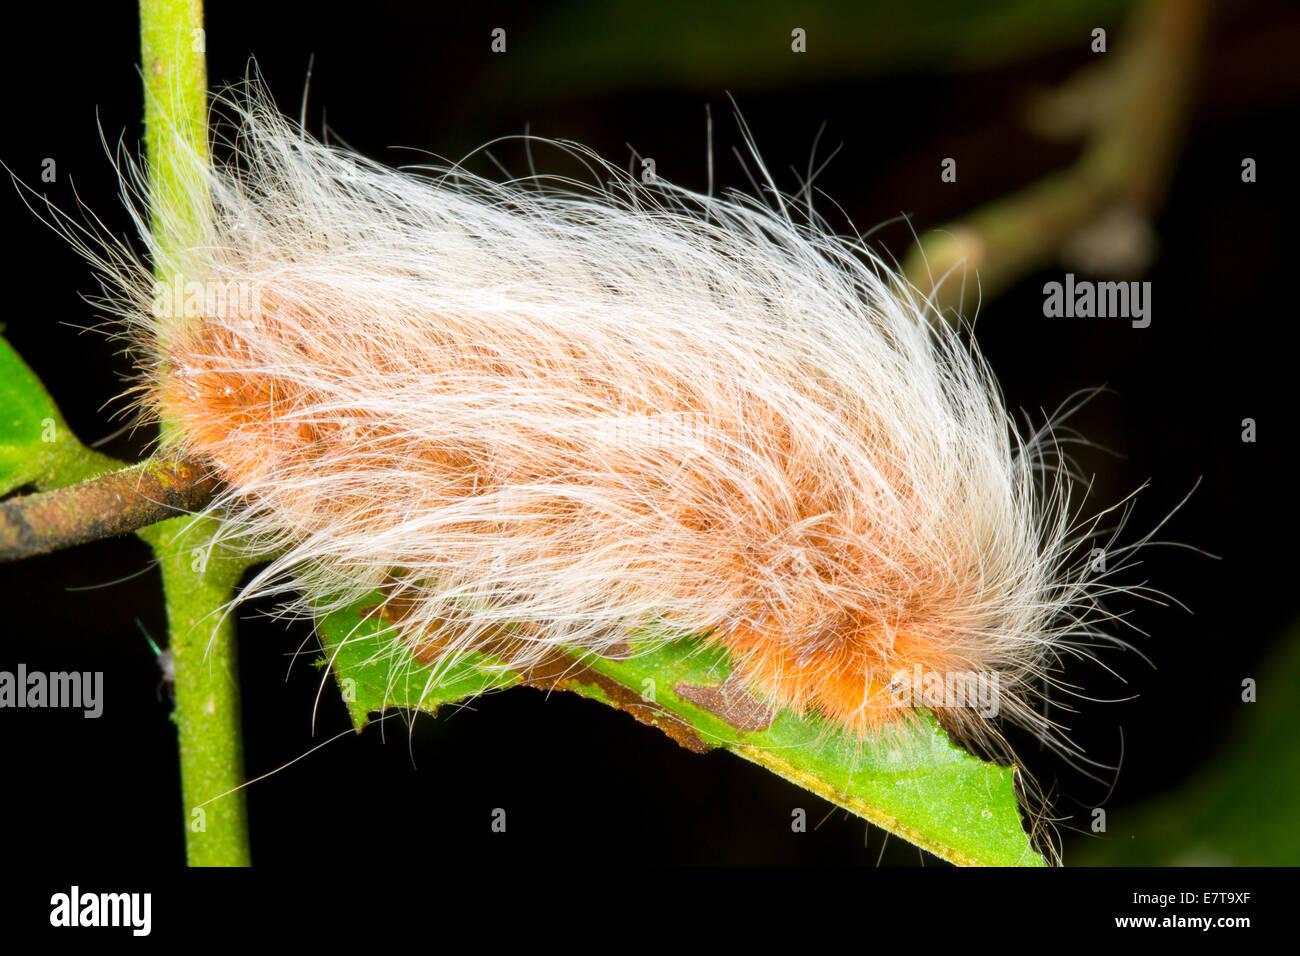 A very hairy caterpillar in the rainforest understory, Ecuador.